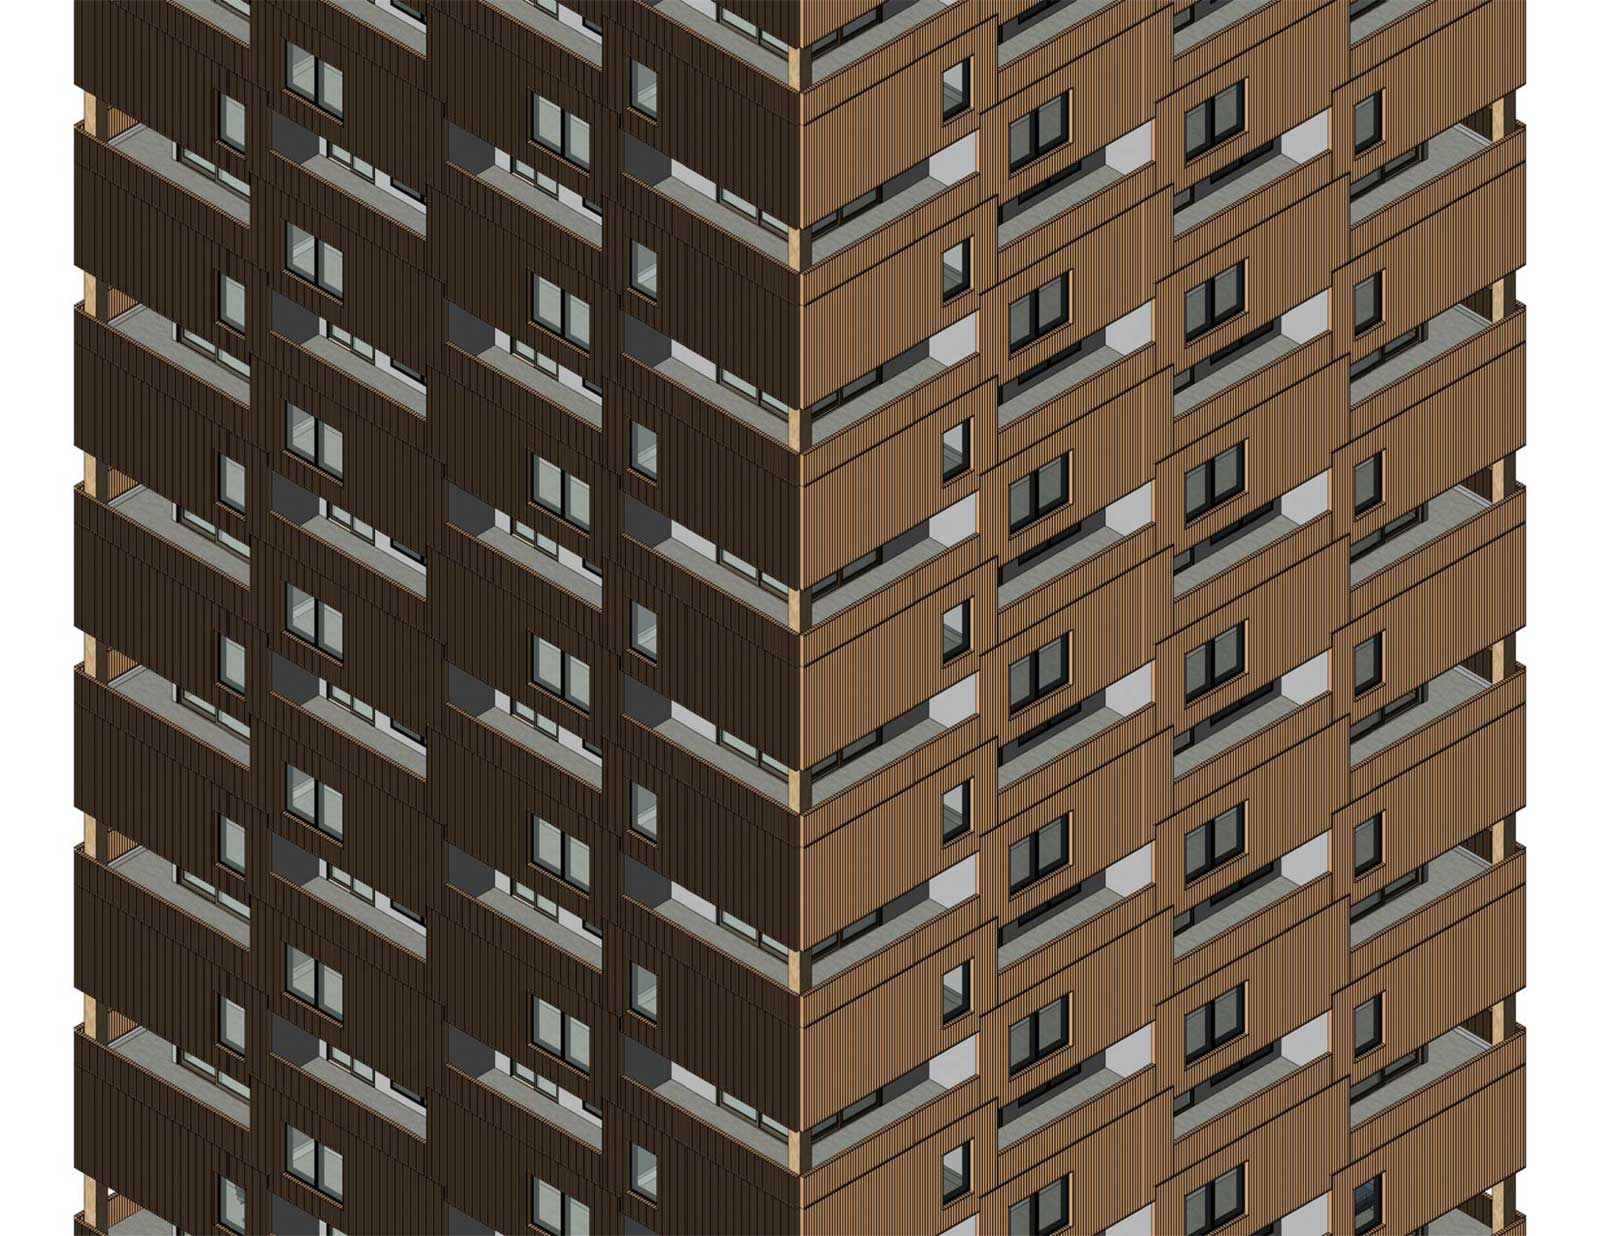 14x30-Timber-Residential-Skyscraper-3.jpg